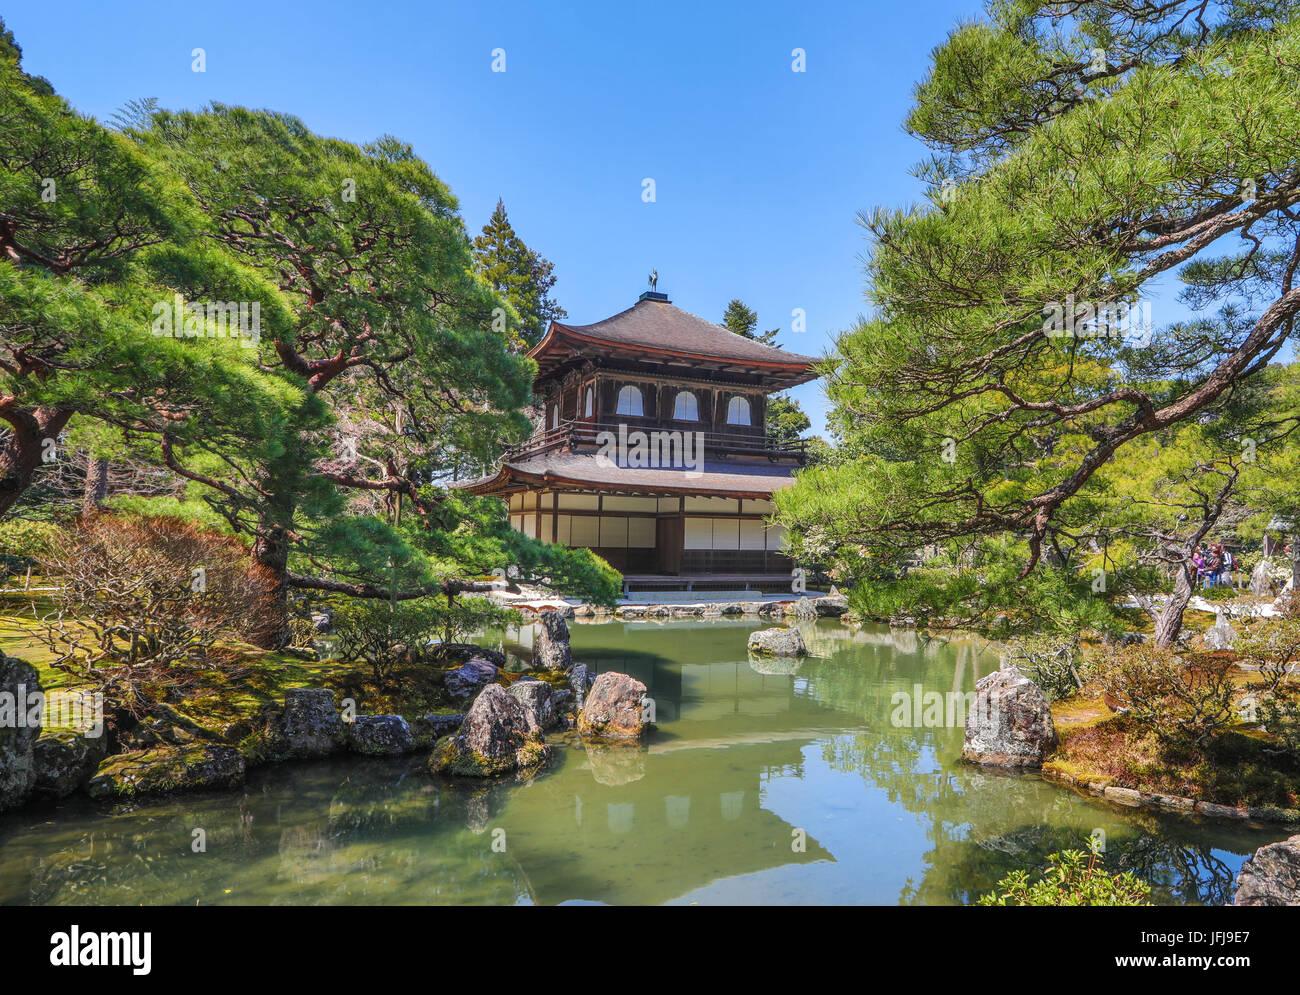 Japan, Kyoto City, Ginkaku-Ji Pavilion - Stock Image